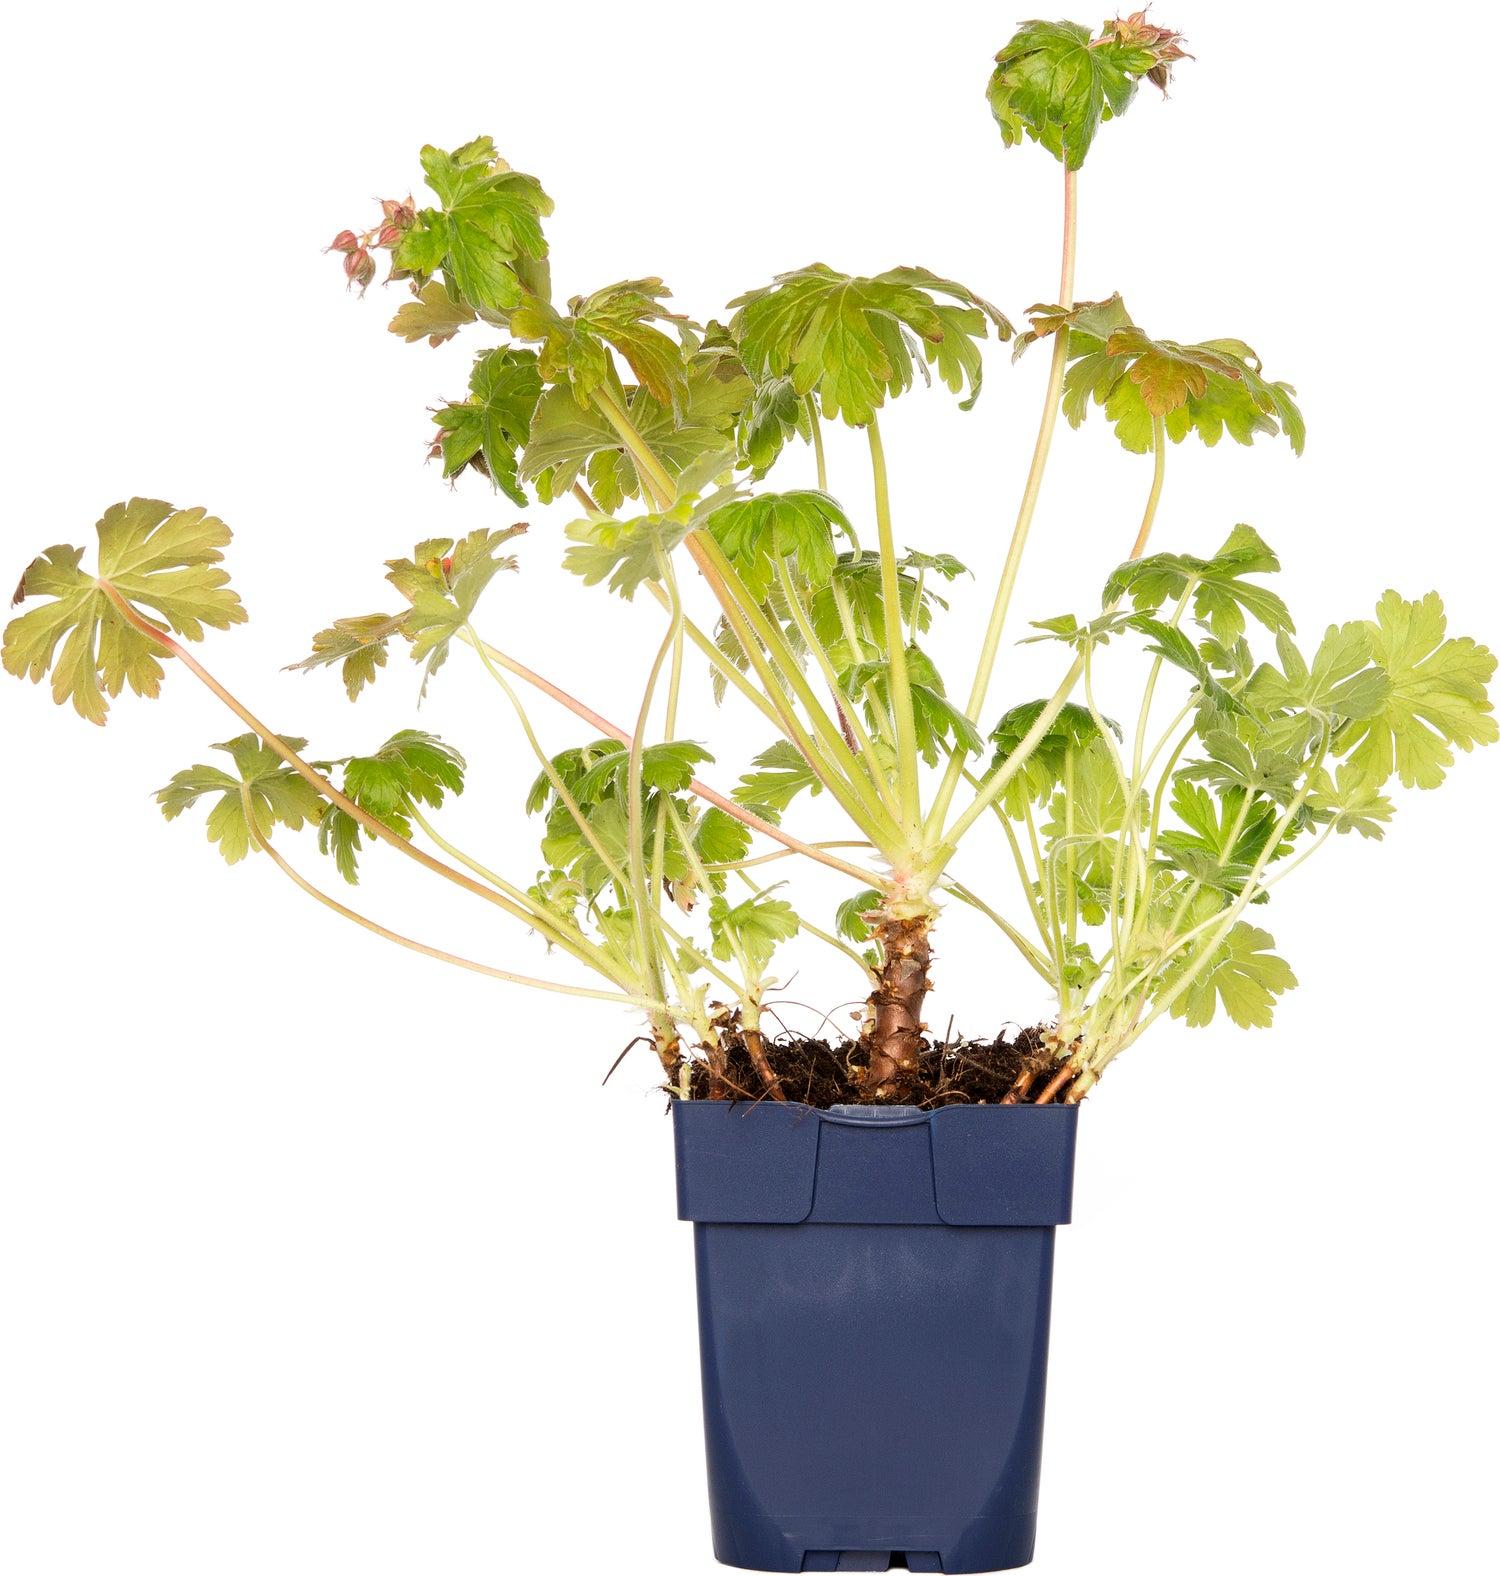 Ooievaarsbek (Geranium macrorrhizum 'Czakor') D 11 cm